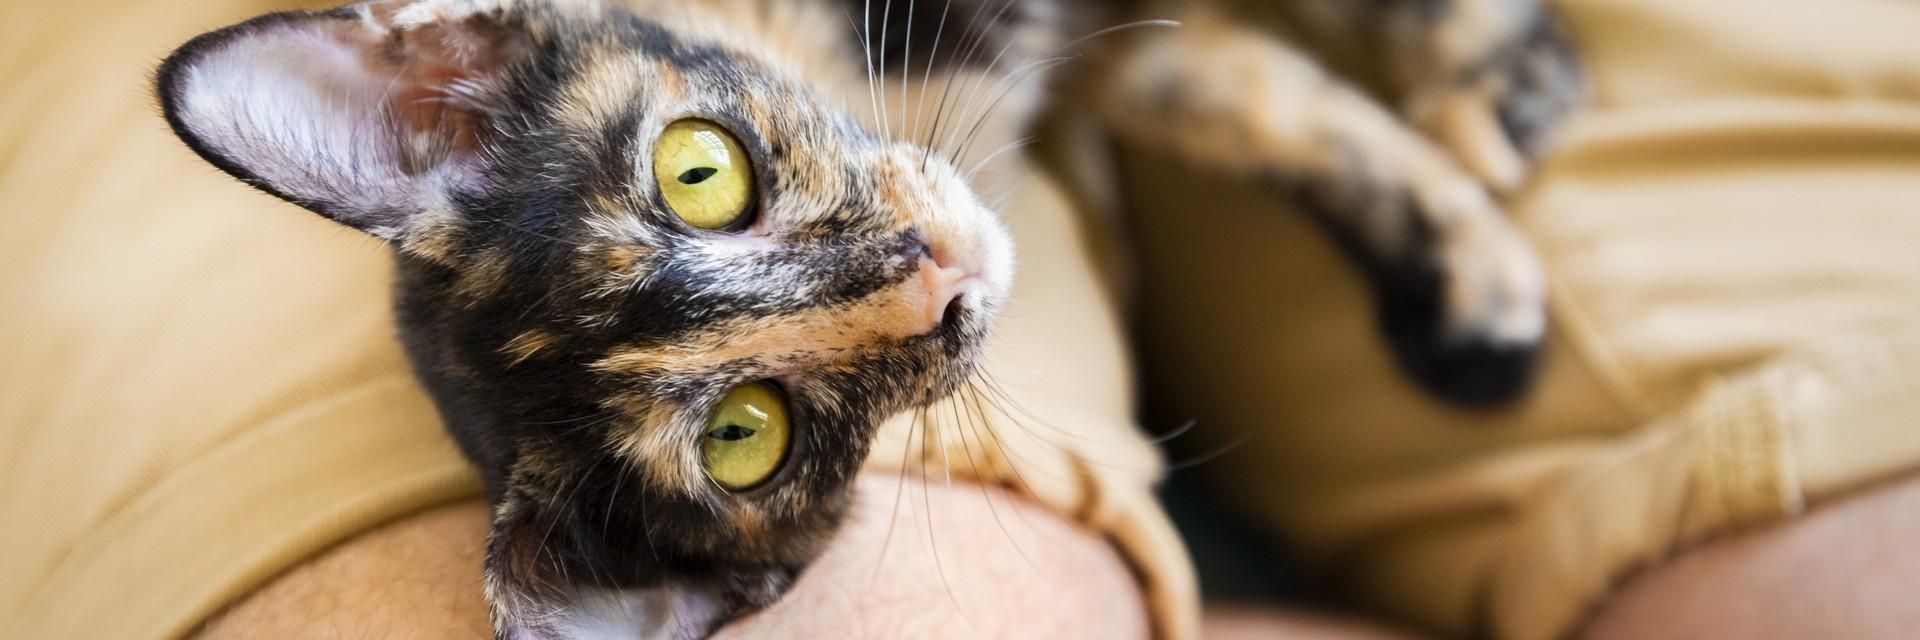 Cat Roxy